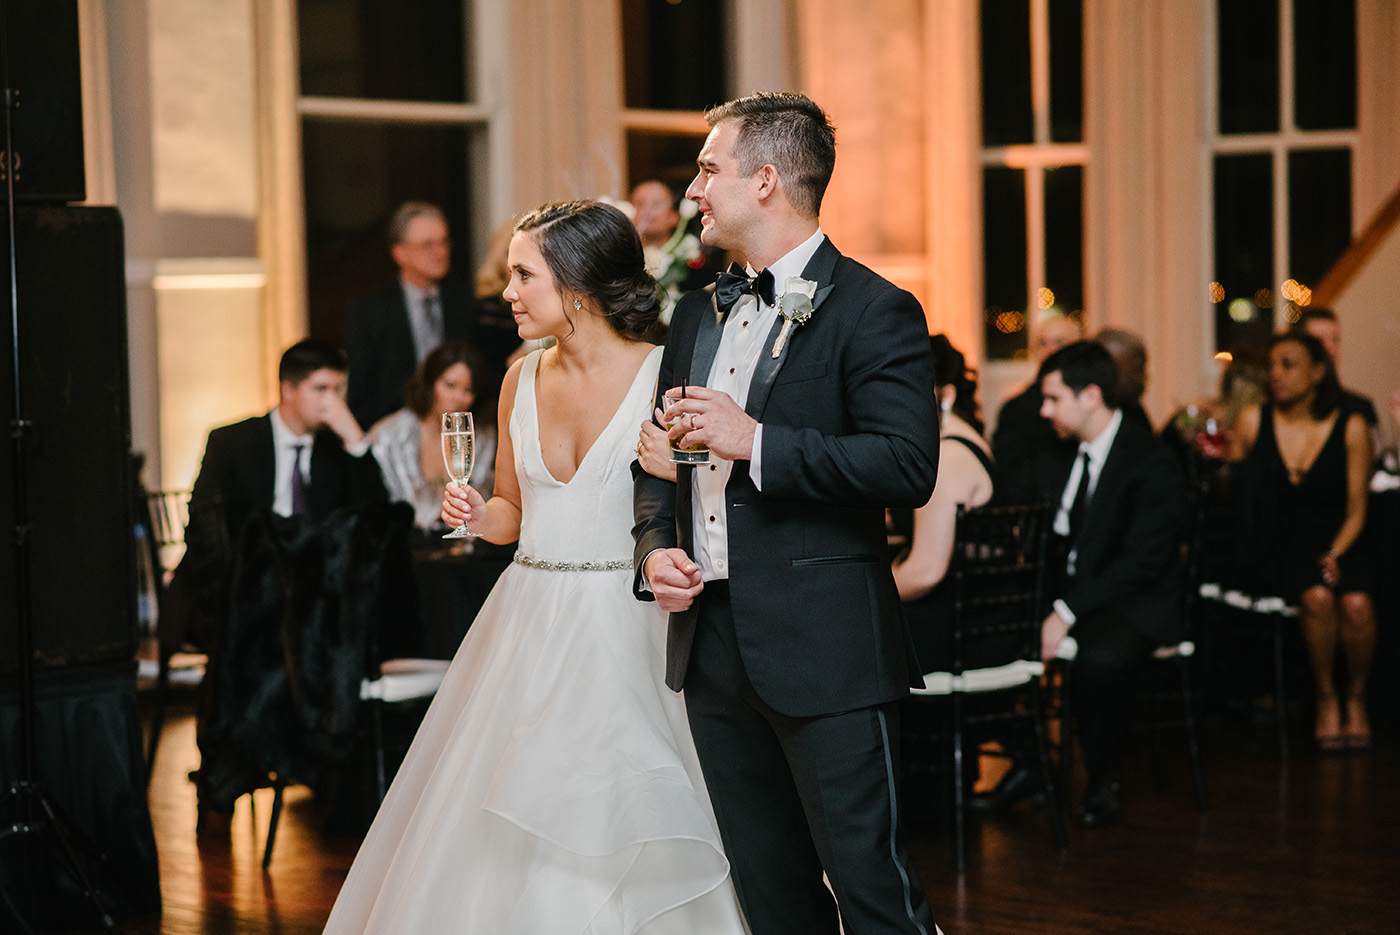 Dallas Wedding Planner - Winter Wedding at The Room on Main - Allday Events - 82.jpg